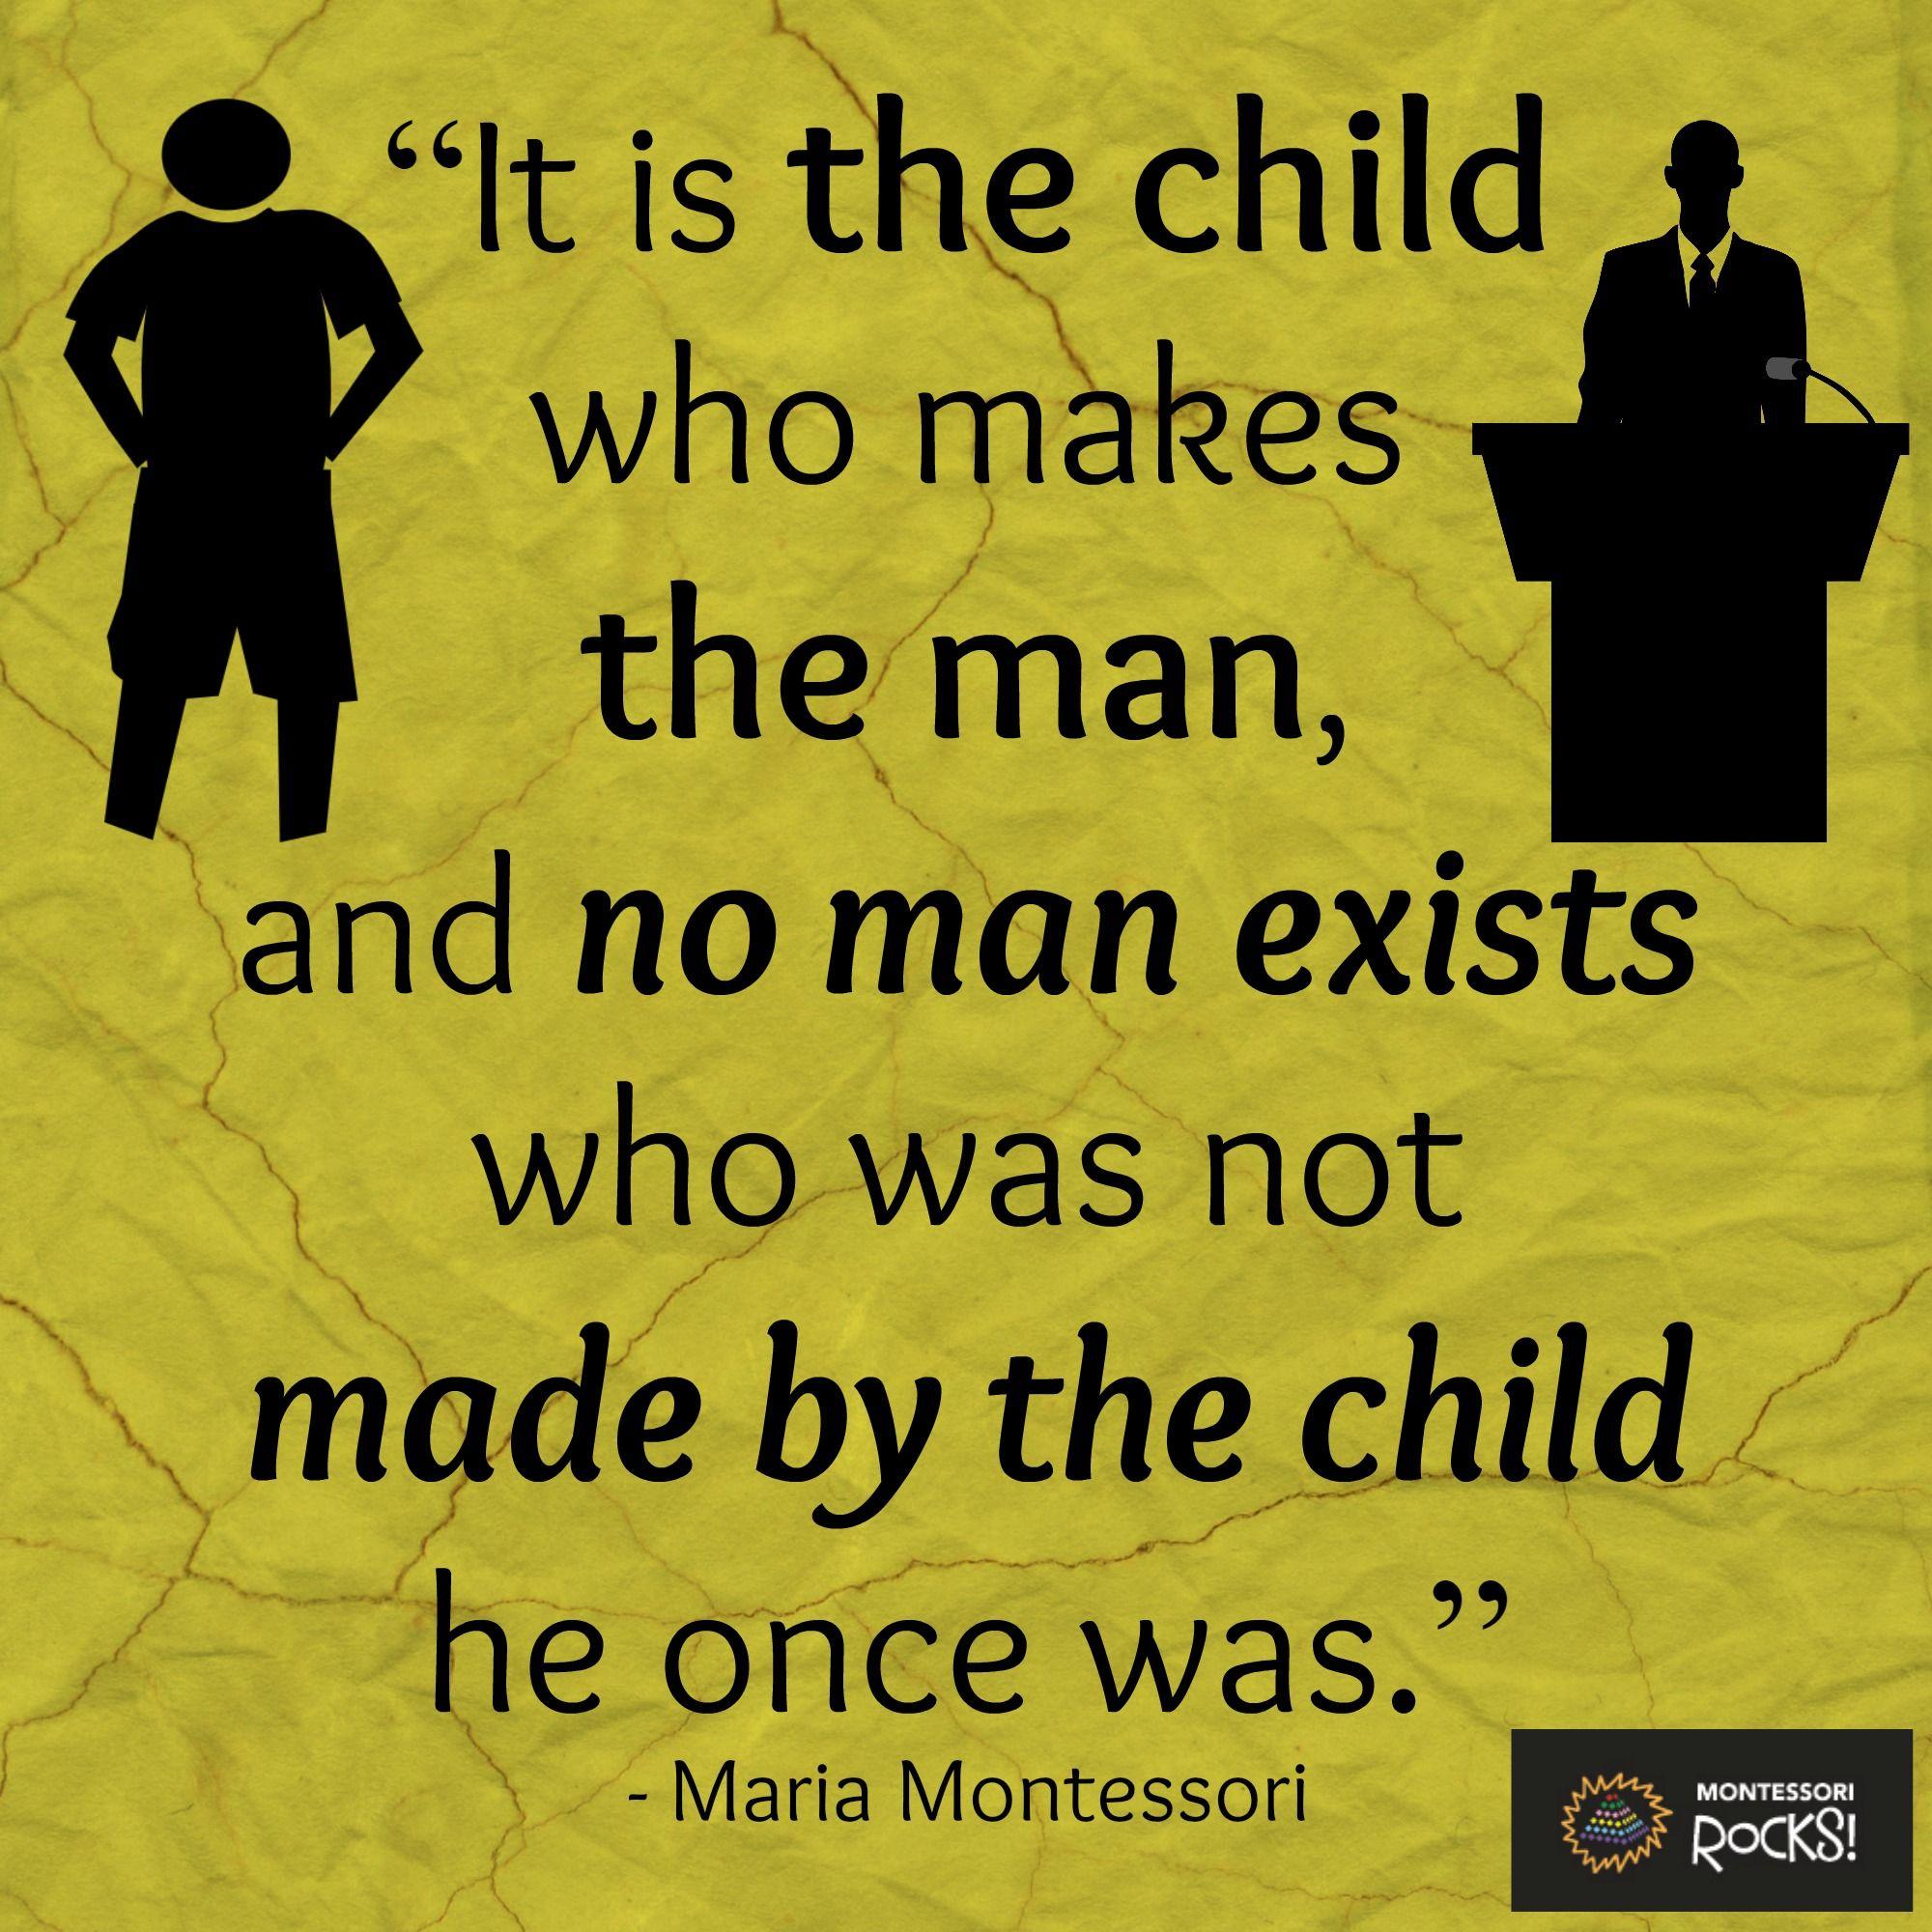 Early Relationship Quotes: We Love Maria Montessori Quotes! #MontessoriRocks